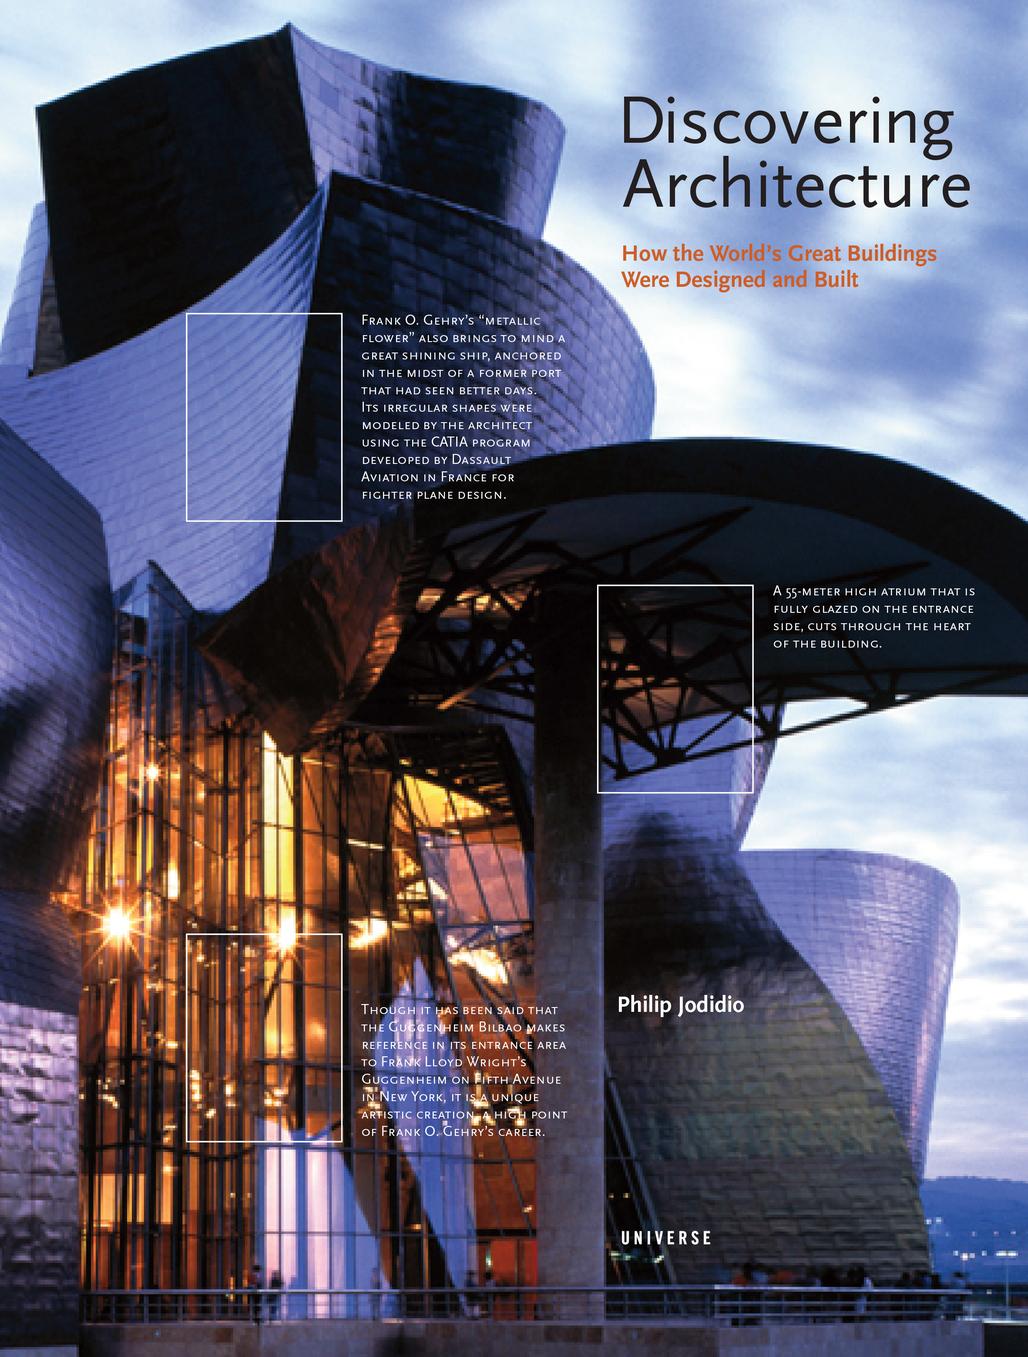 ® Discovering Architecture by Philip Jodidio, Universe Publishing, 2013.